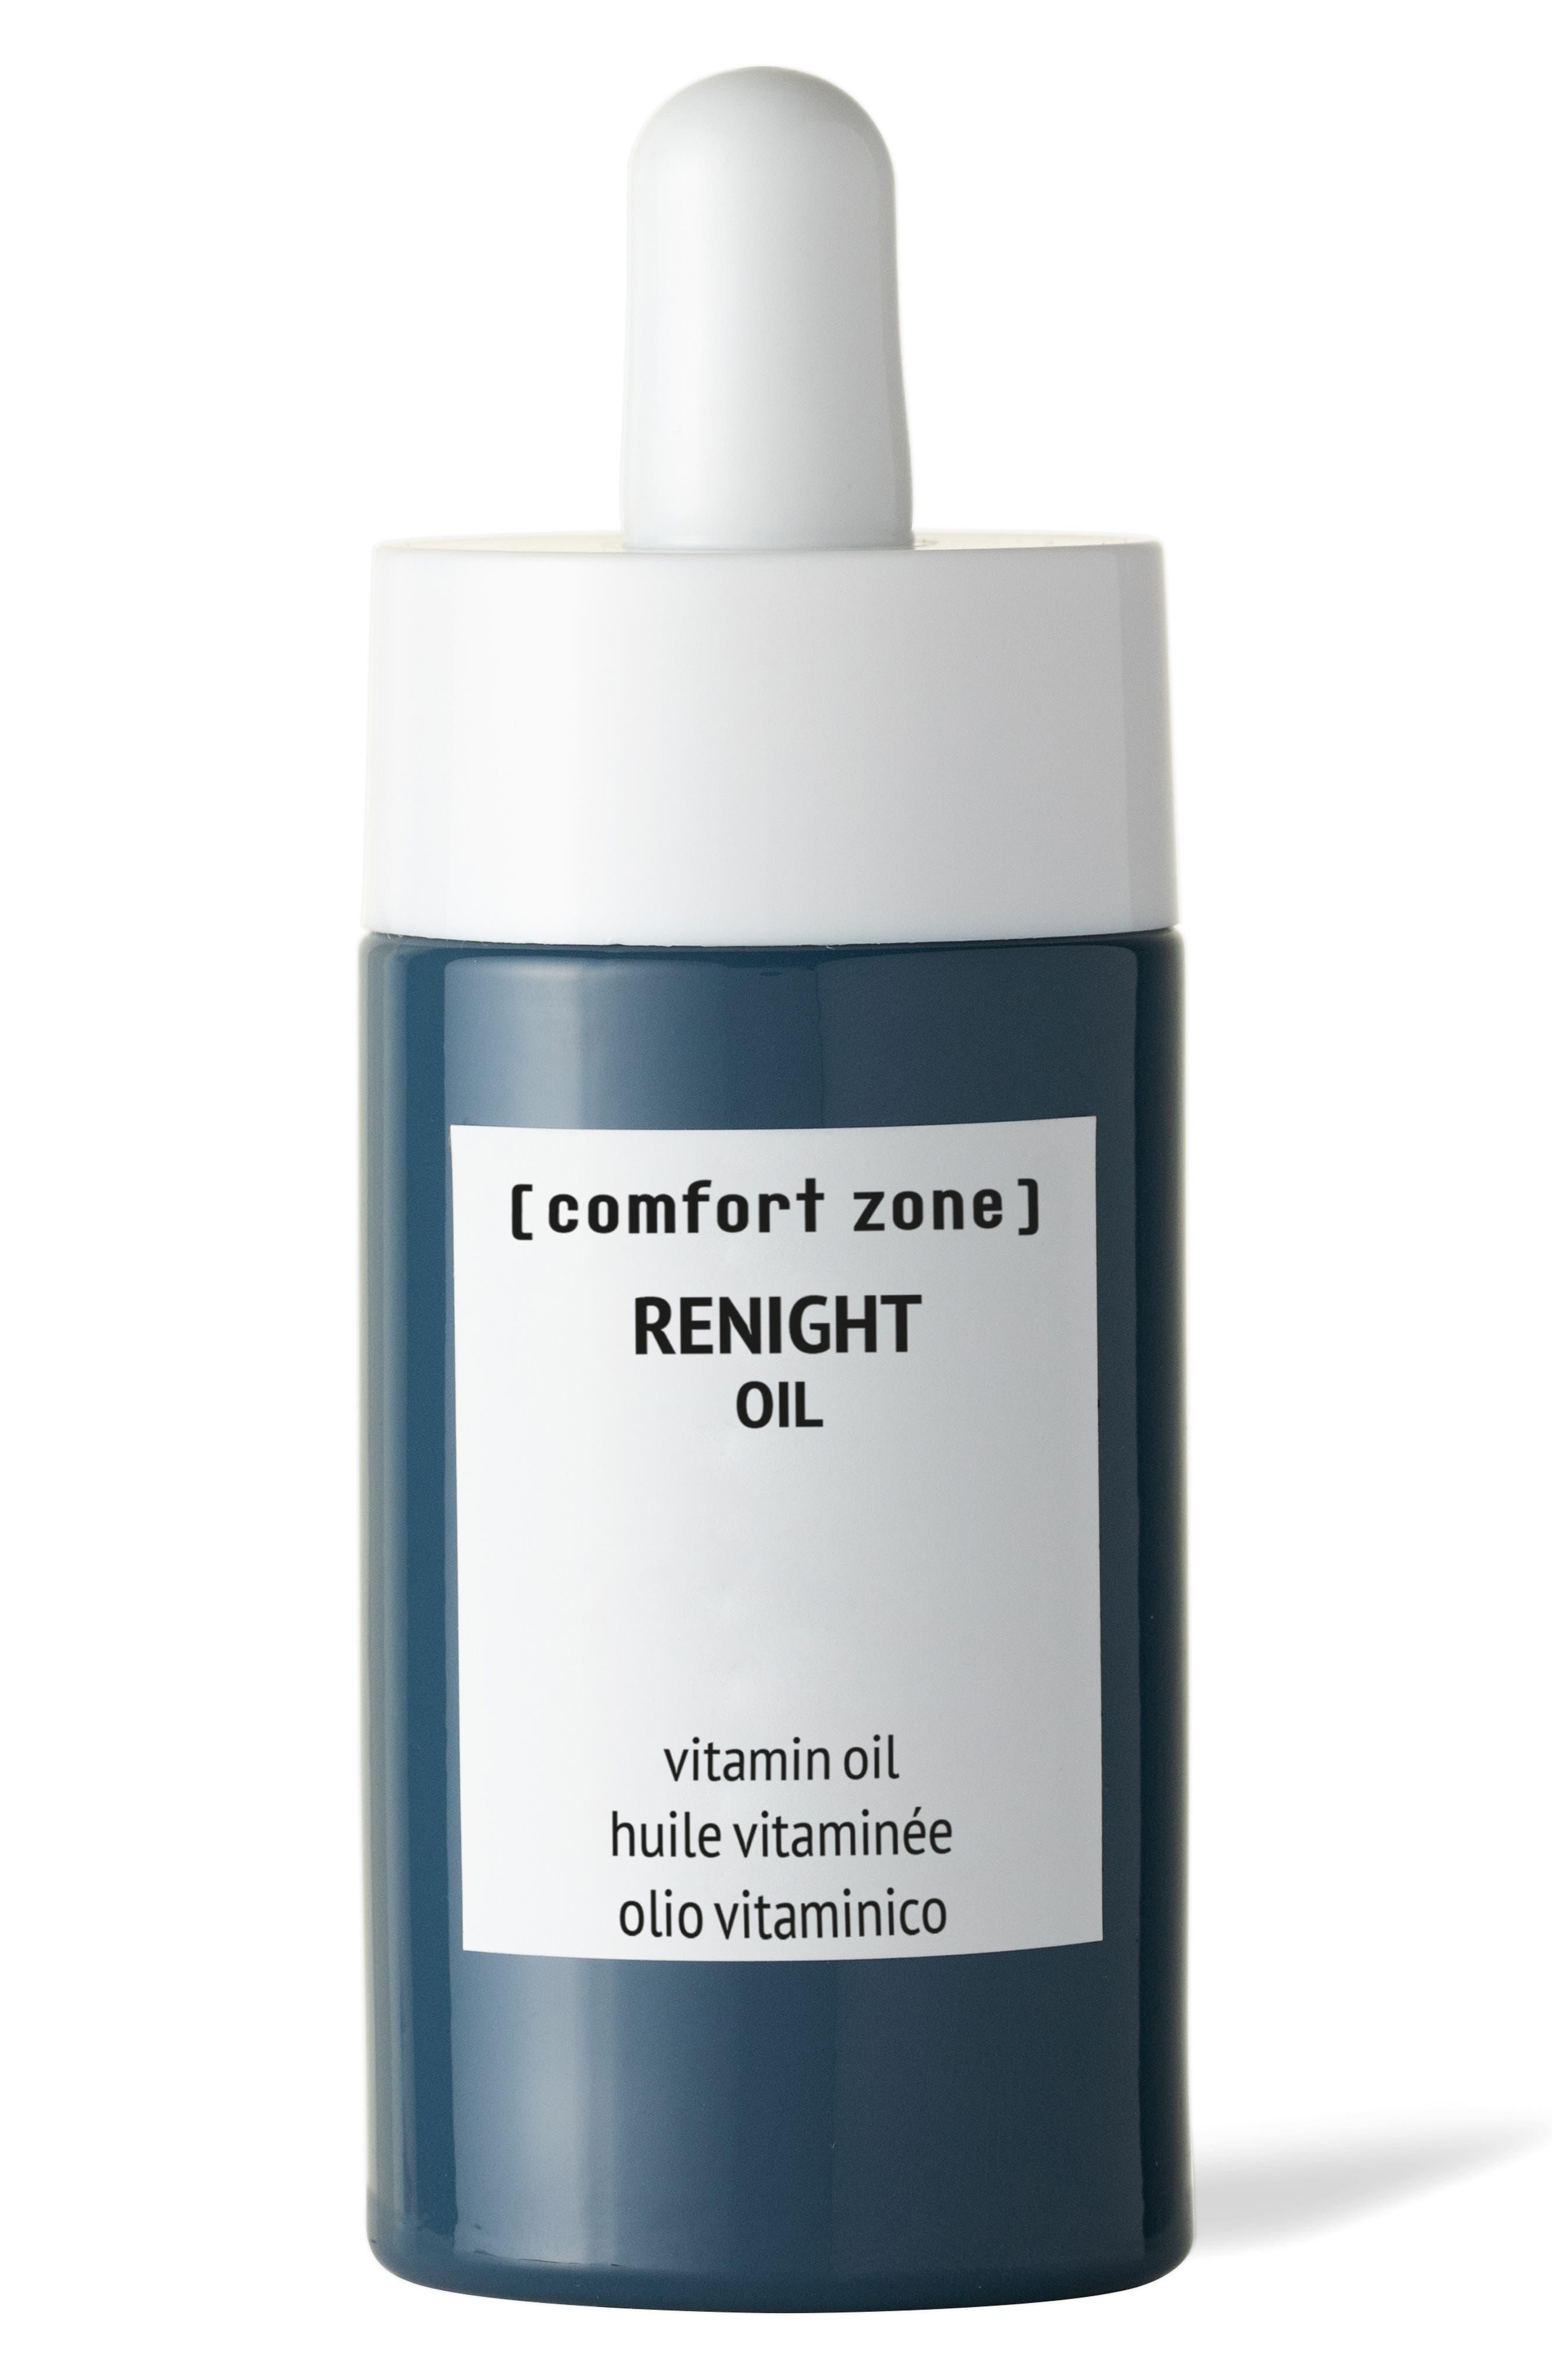 Renight Oil Nourishing Vitamin Oil